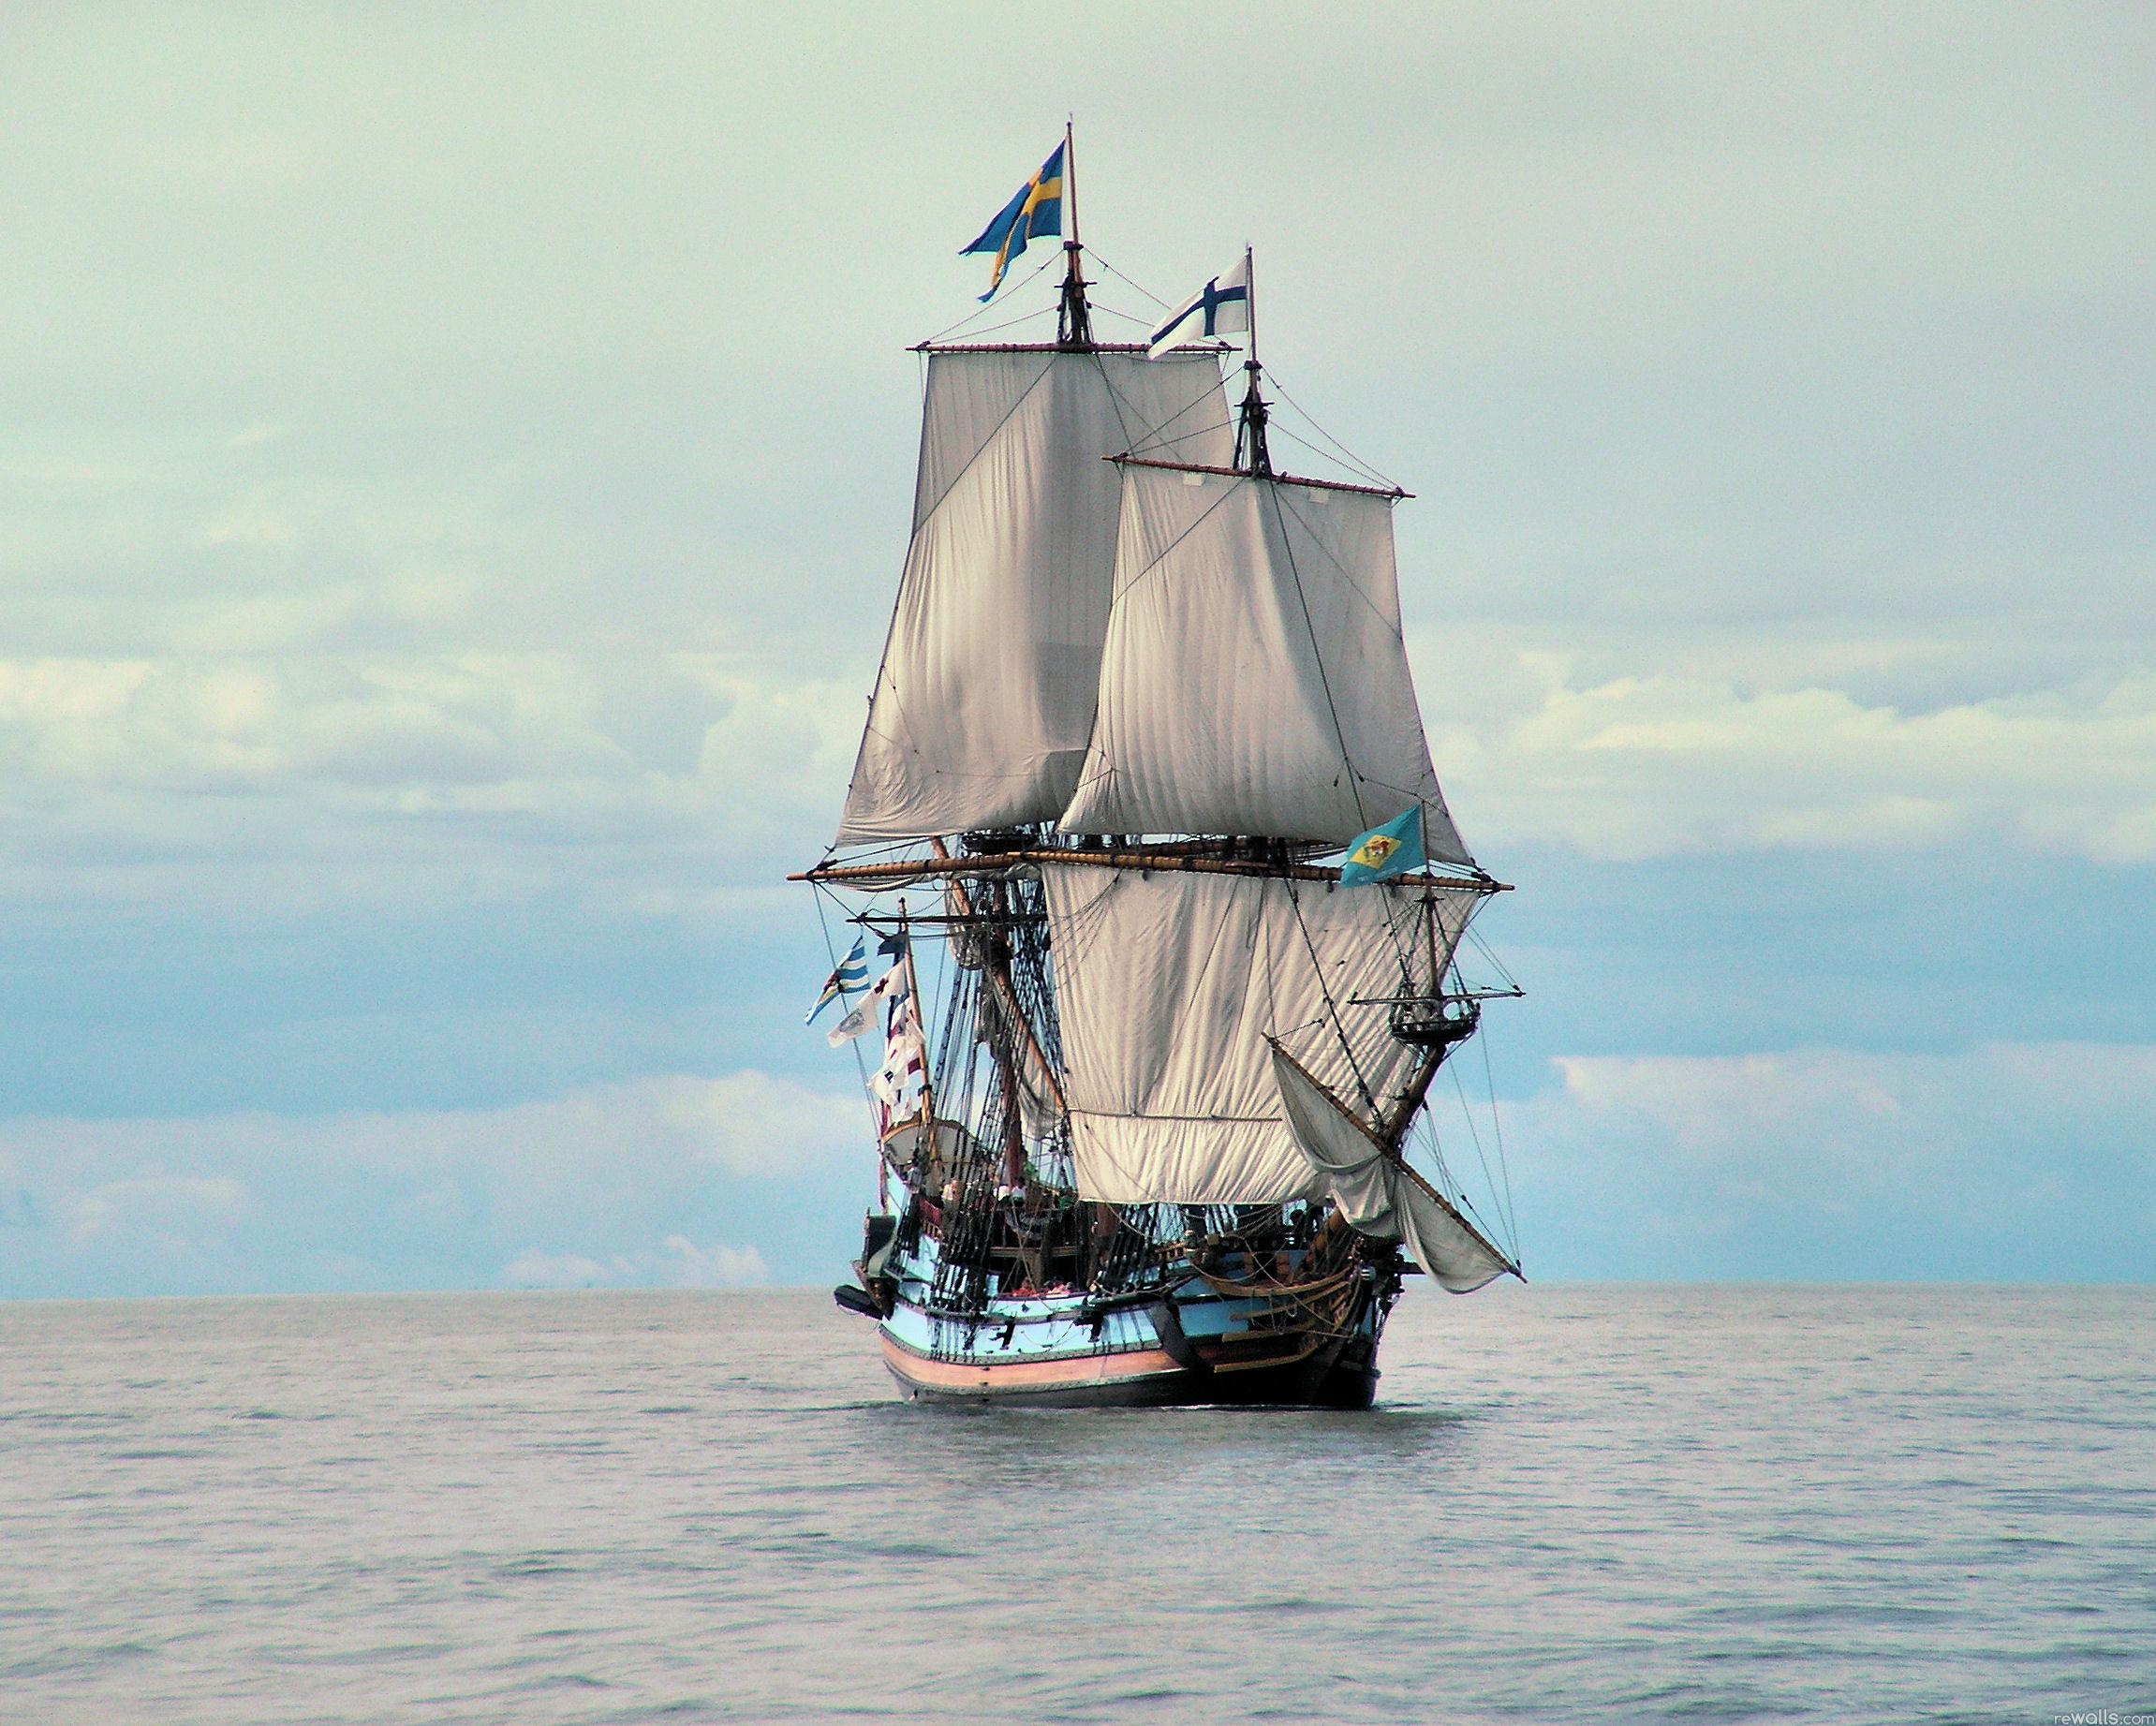 HD Widescreen Sailing Ship Wallpaper - WallpaperSafari